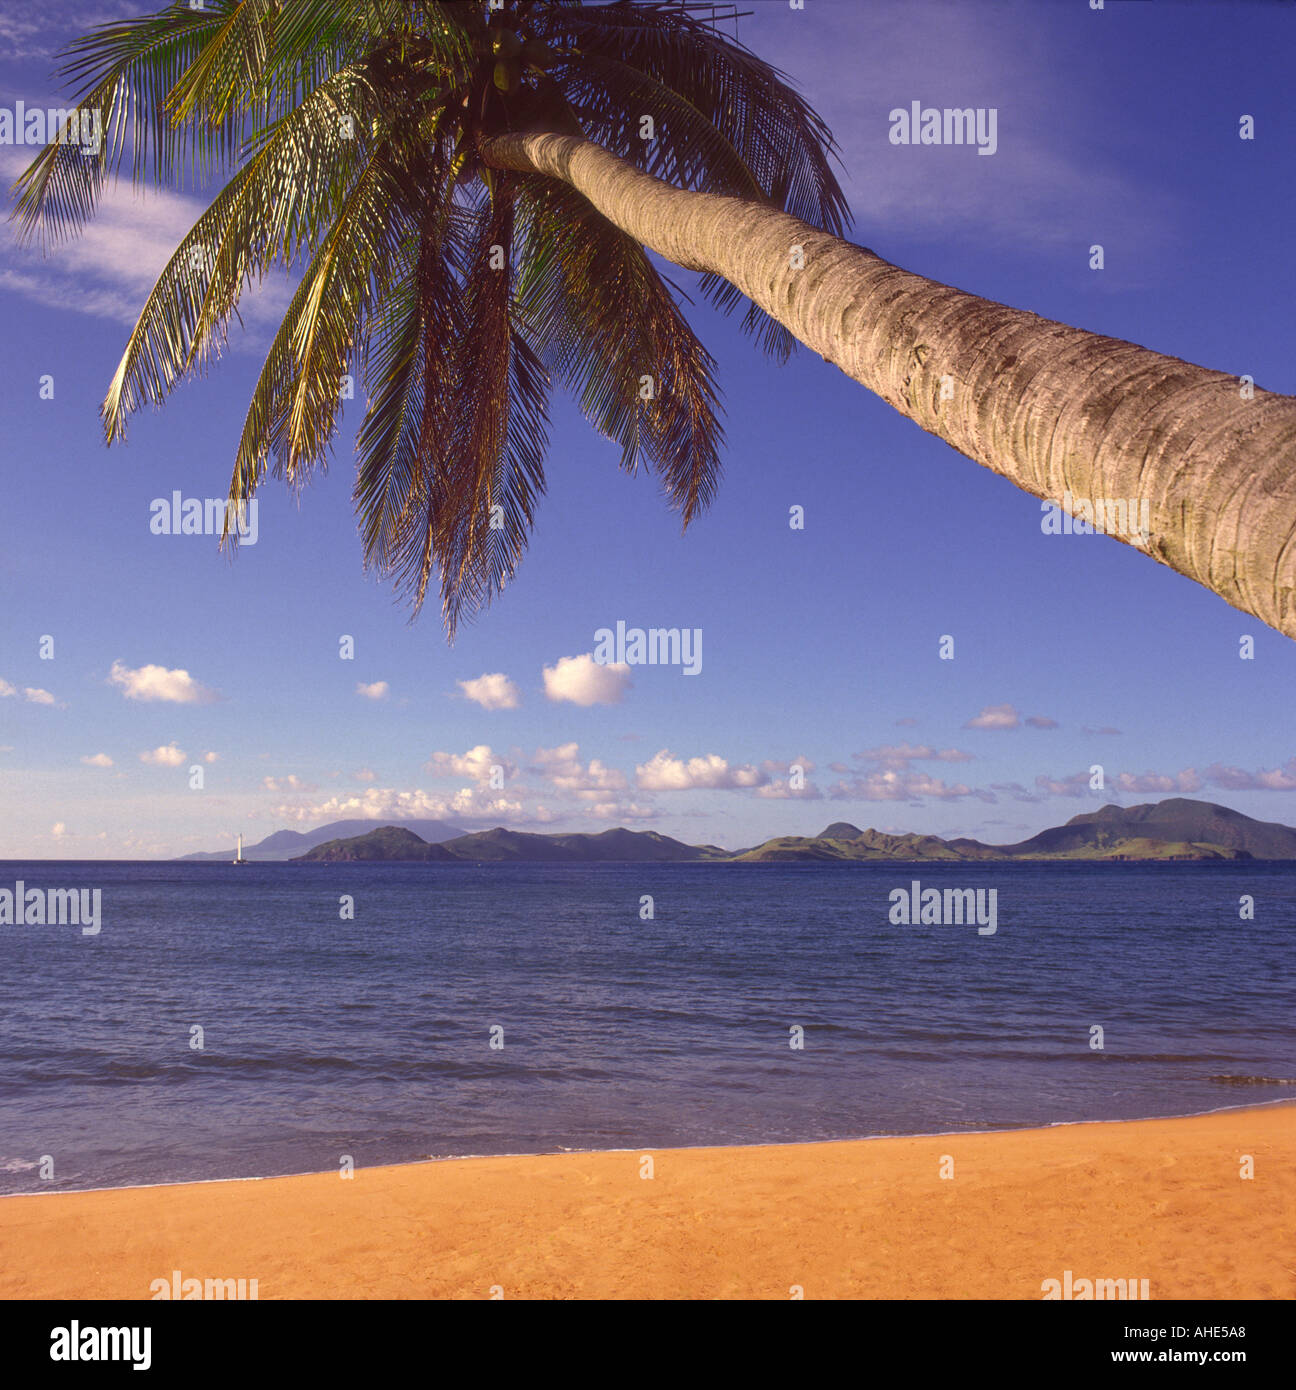 Deserted Island Beach: Typical Tropical Desert Island Style Beach Framed By